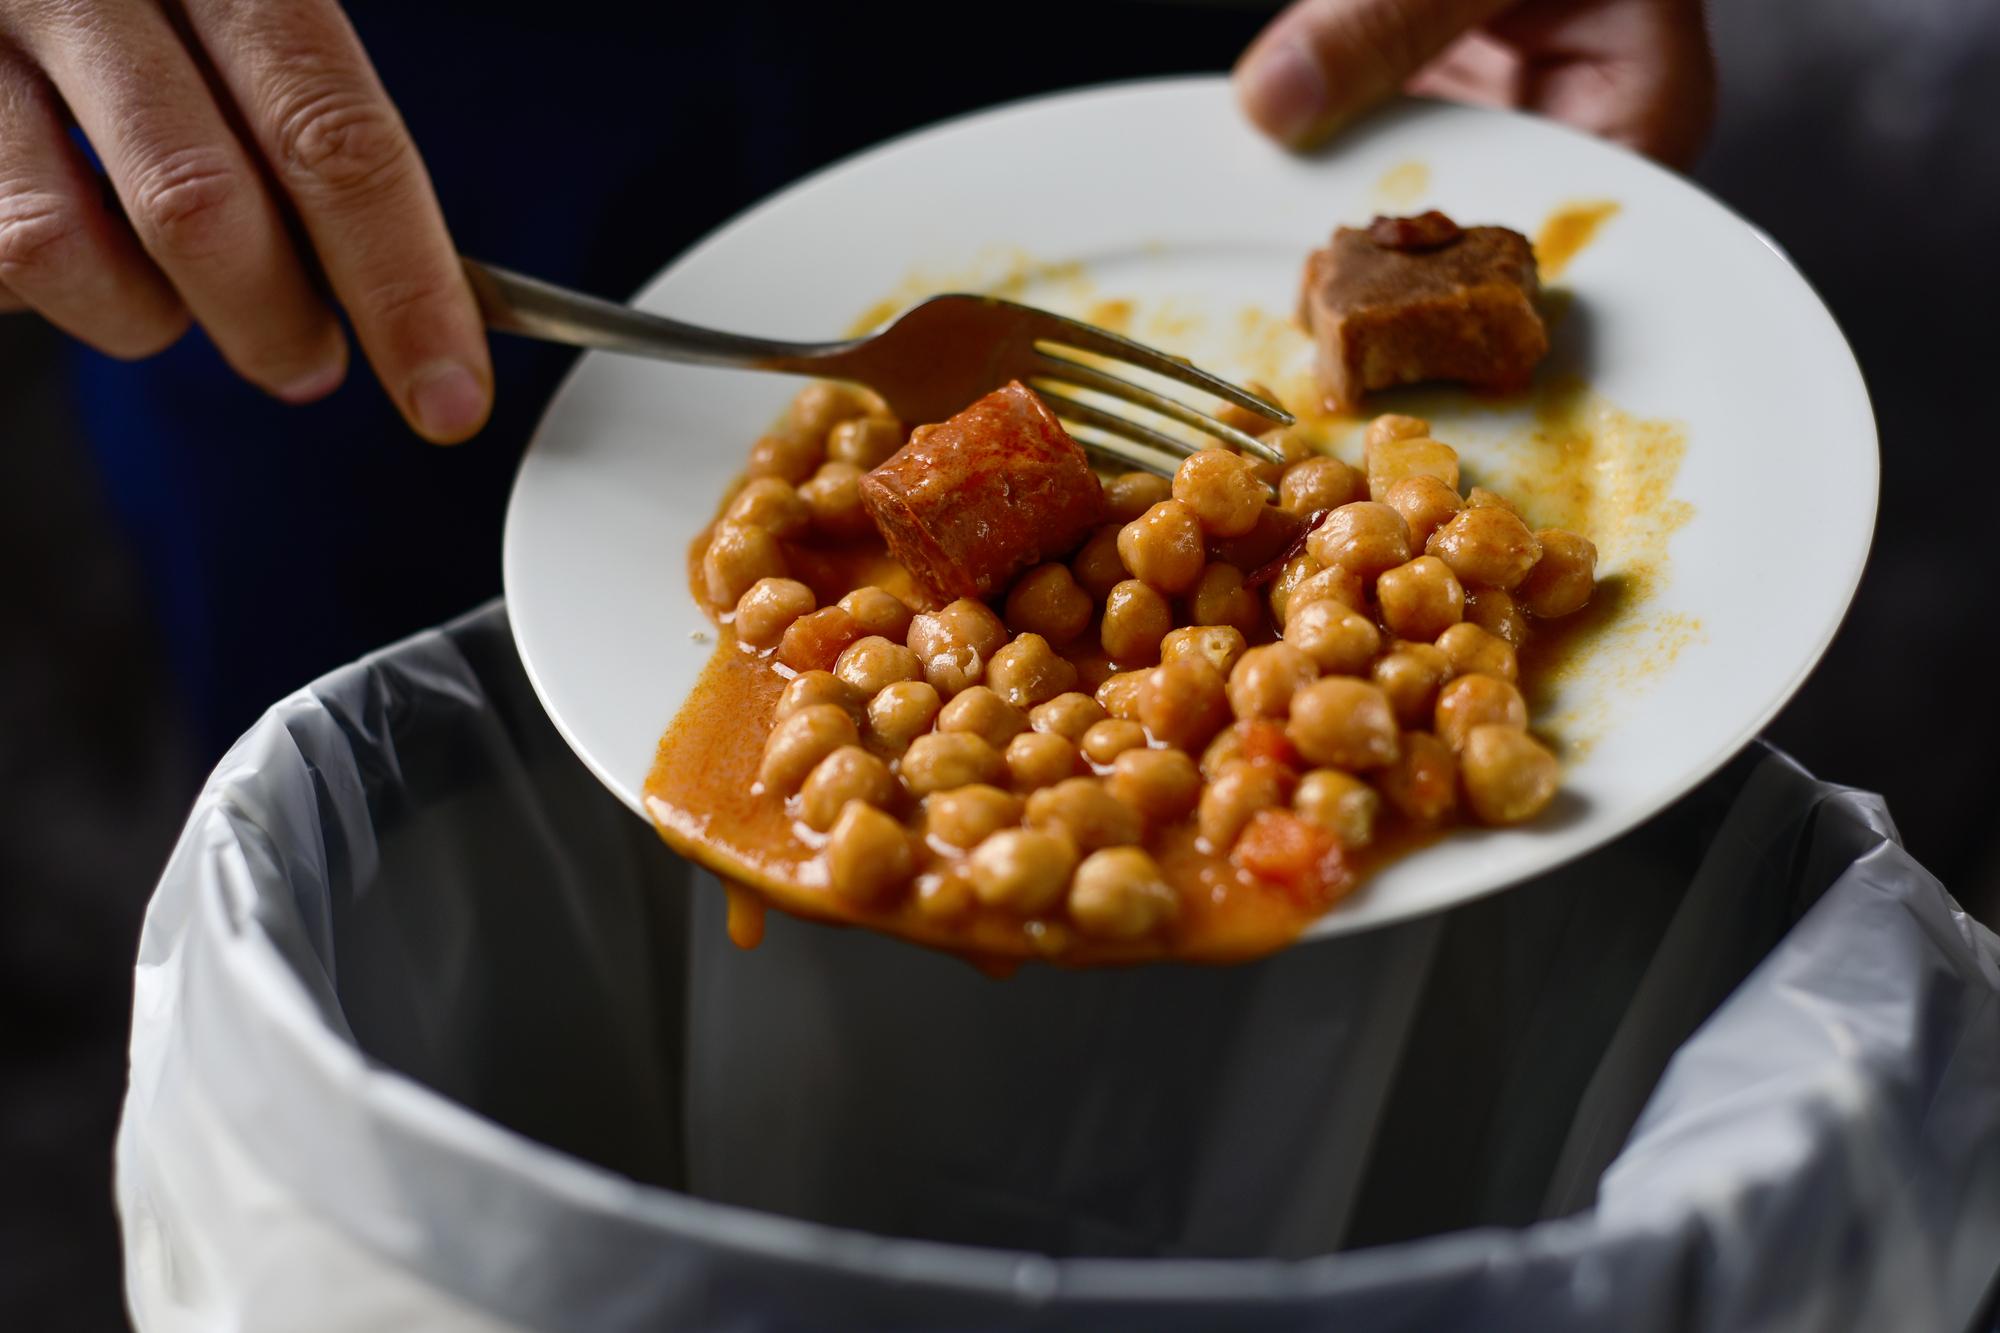 Food Waste Index-Report 2021